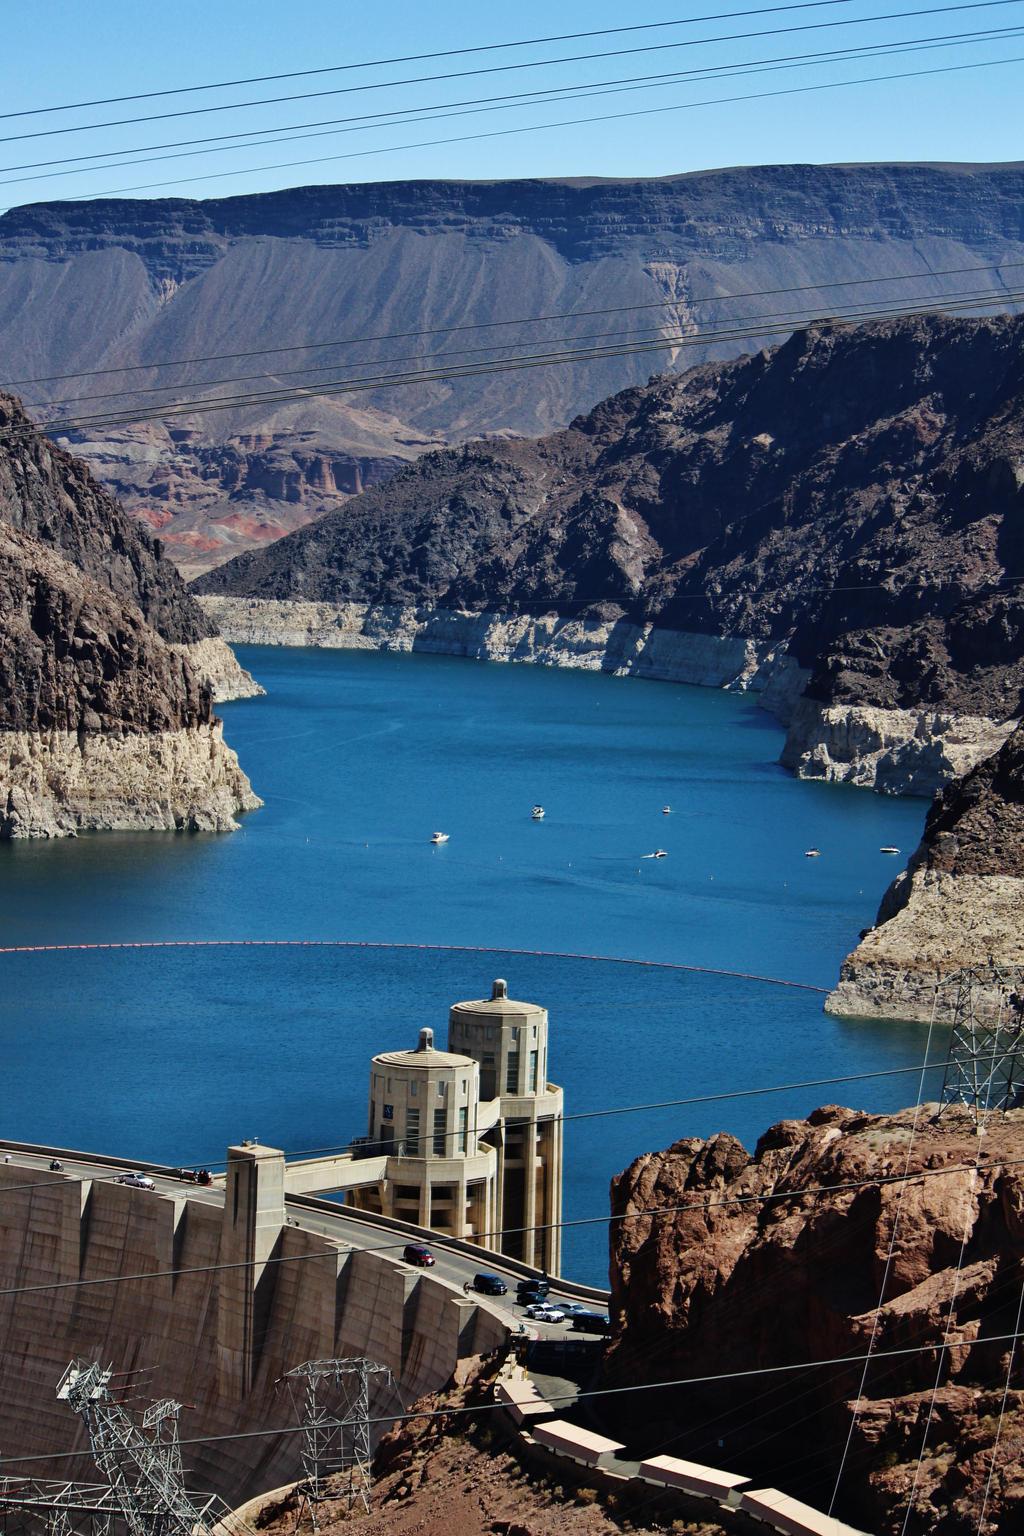 Hoover Dam's Beauty by AthenaIce